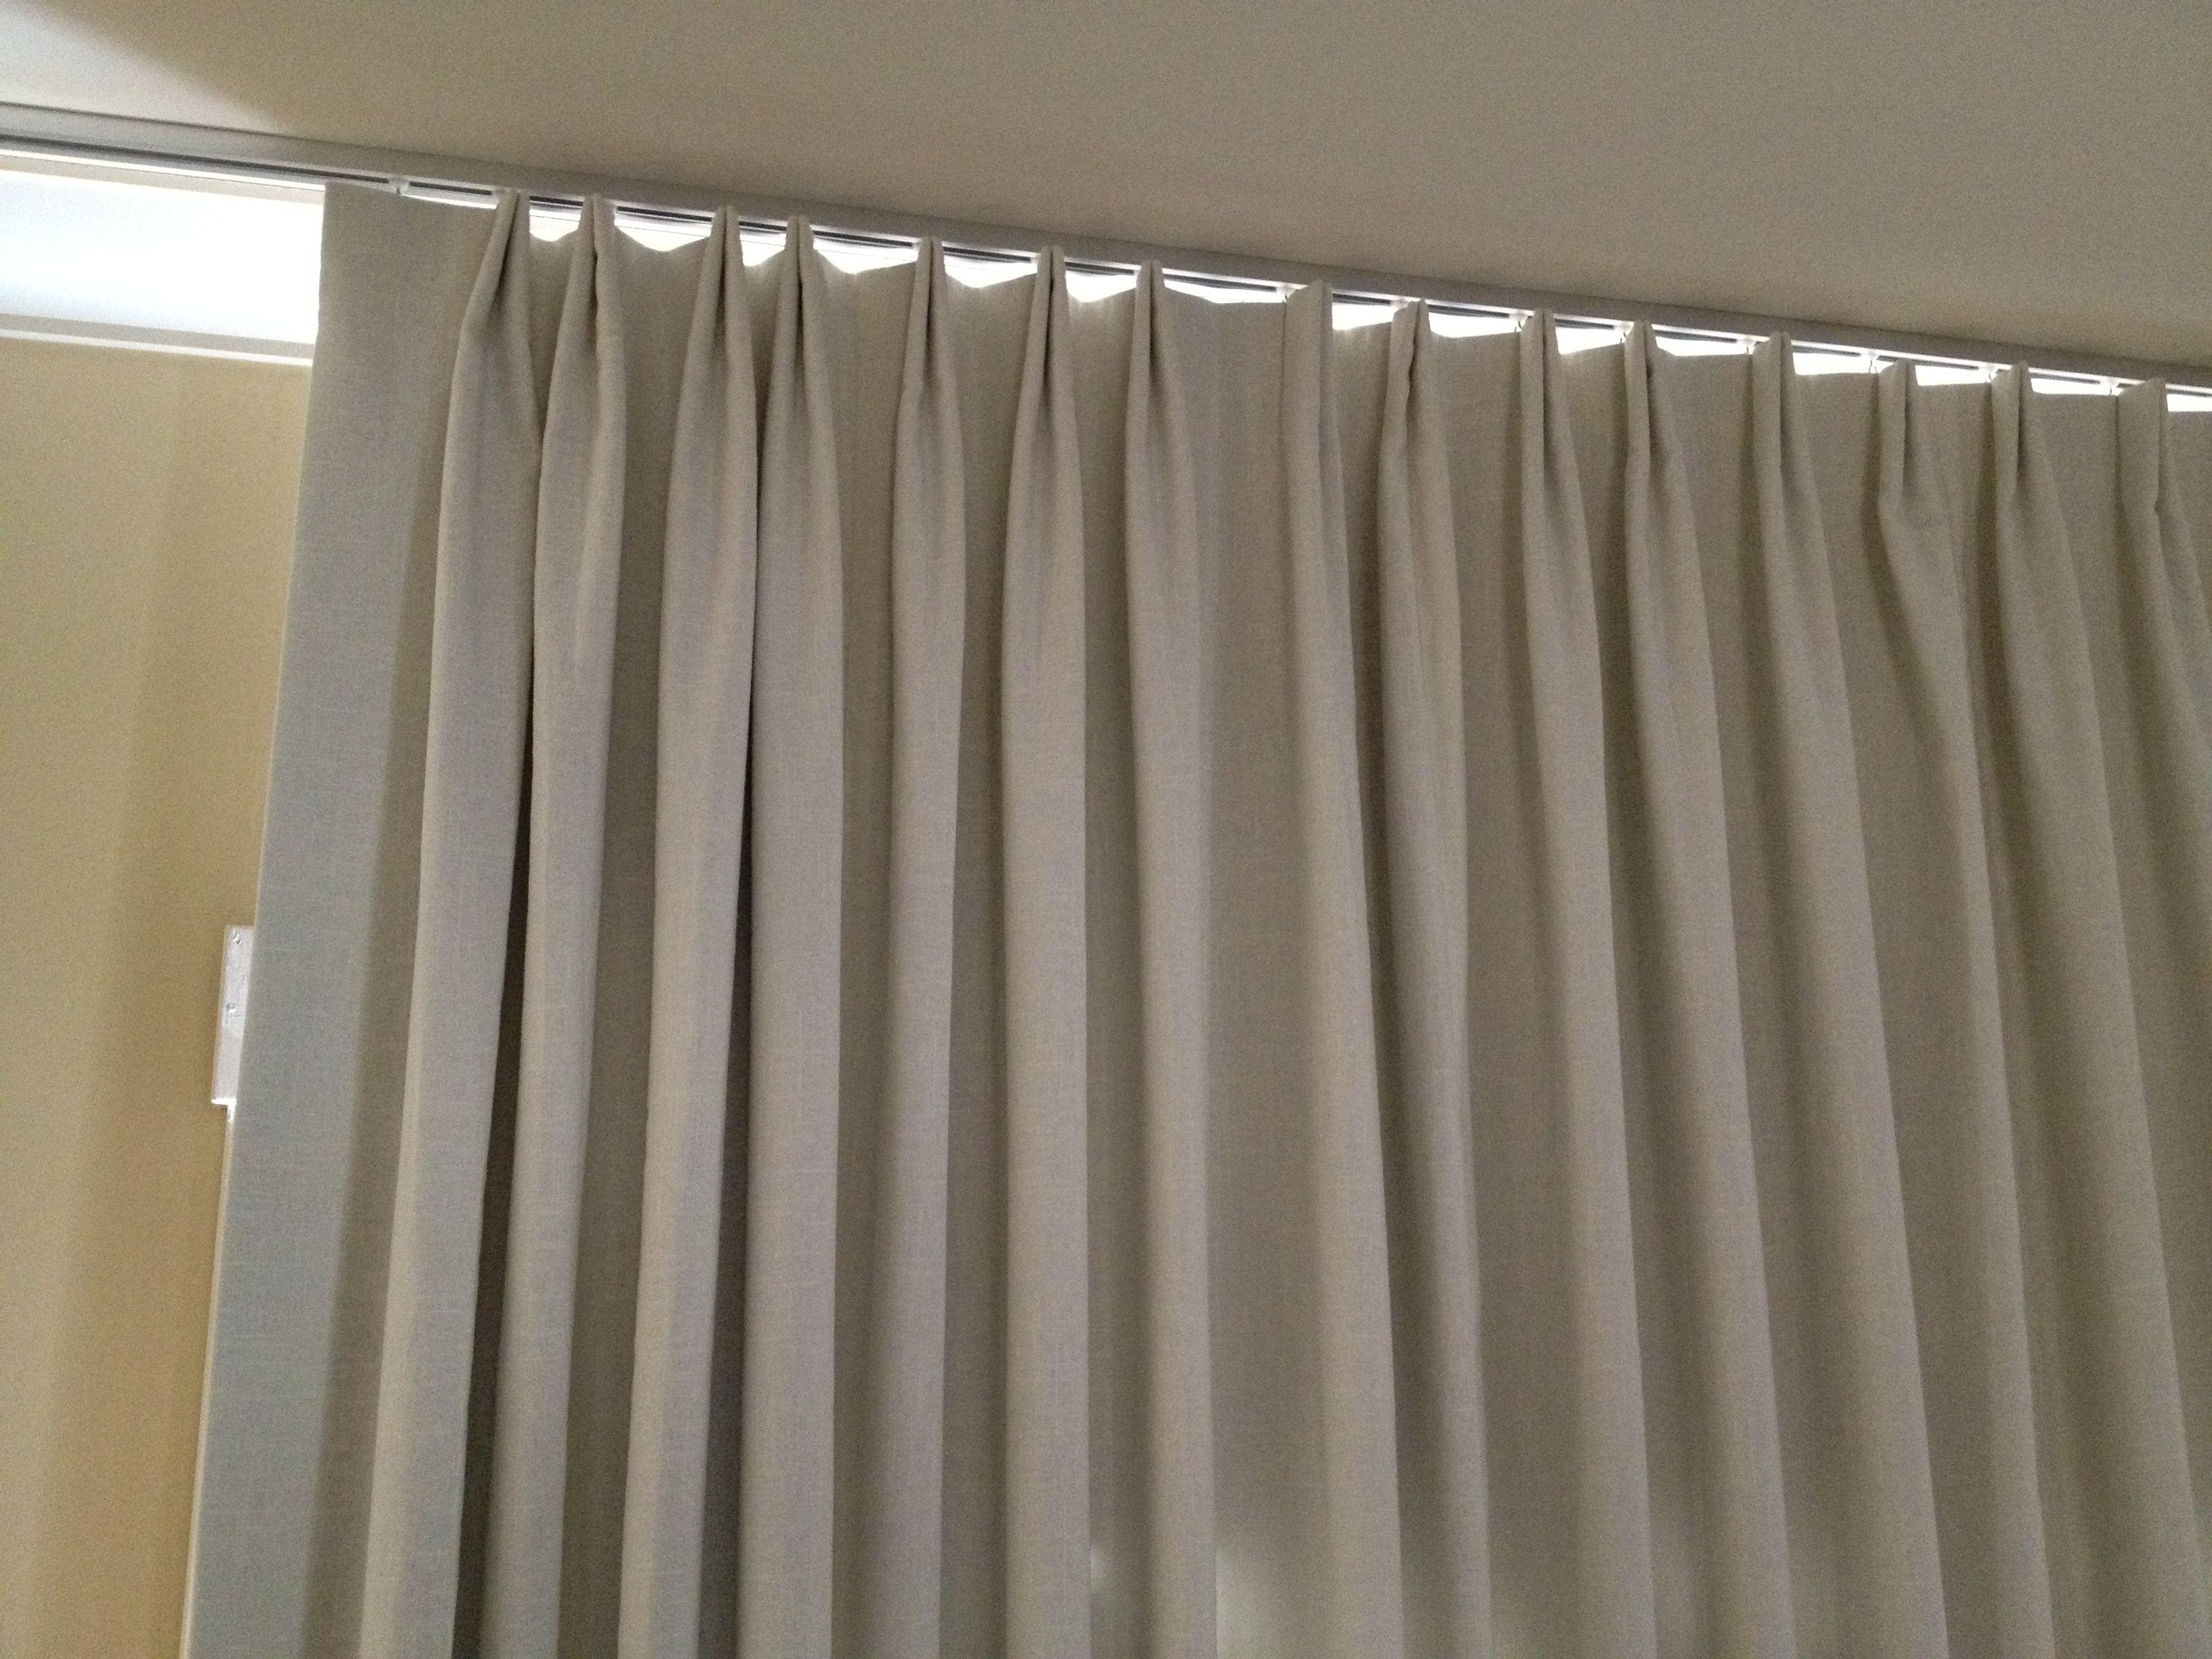 Parisian Pleat Curtain On Ceiling Track Curtains Cool Curtains